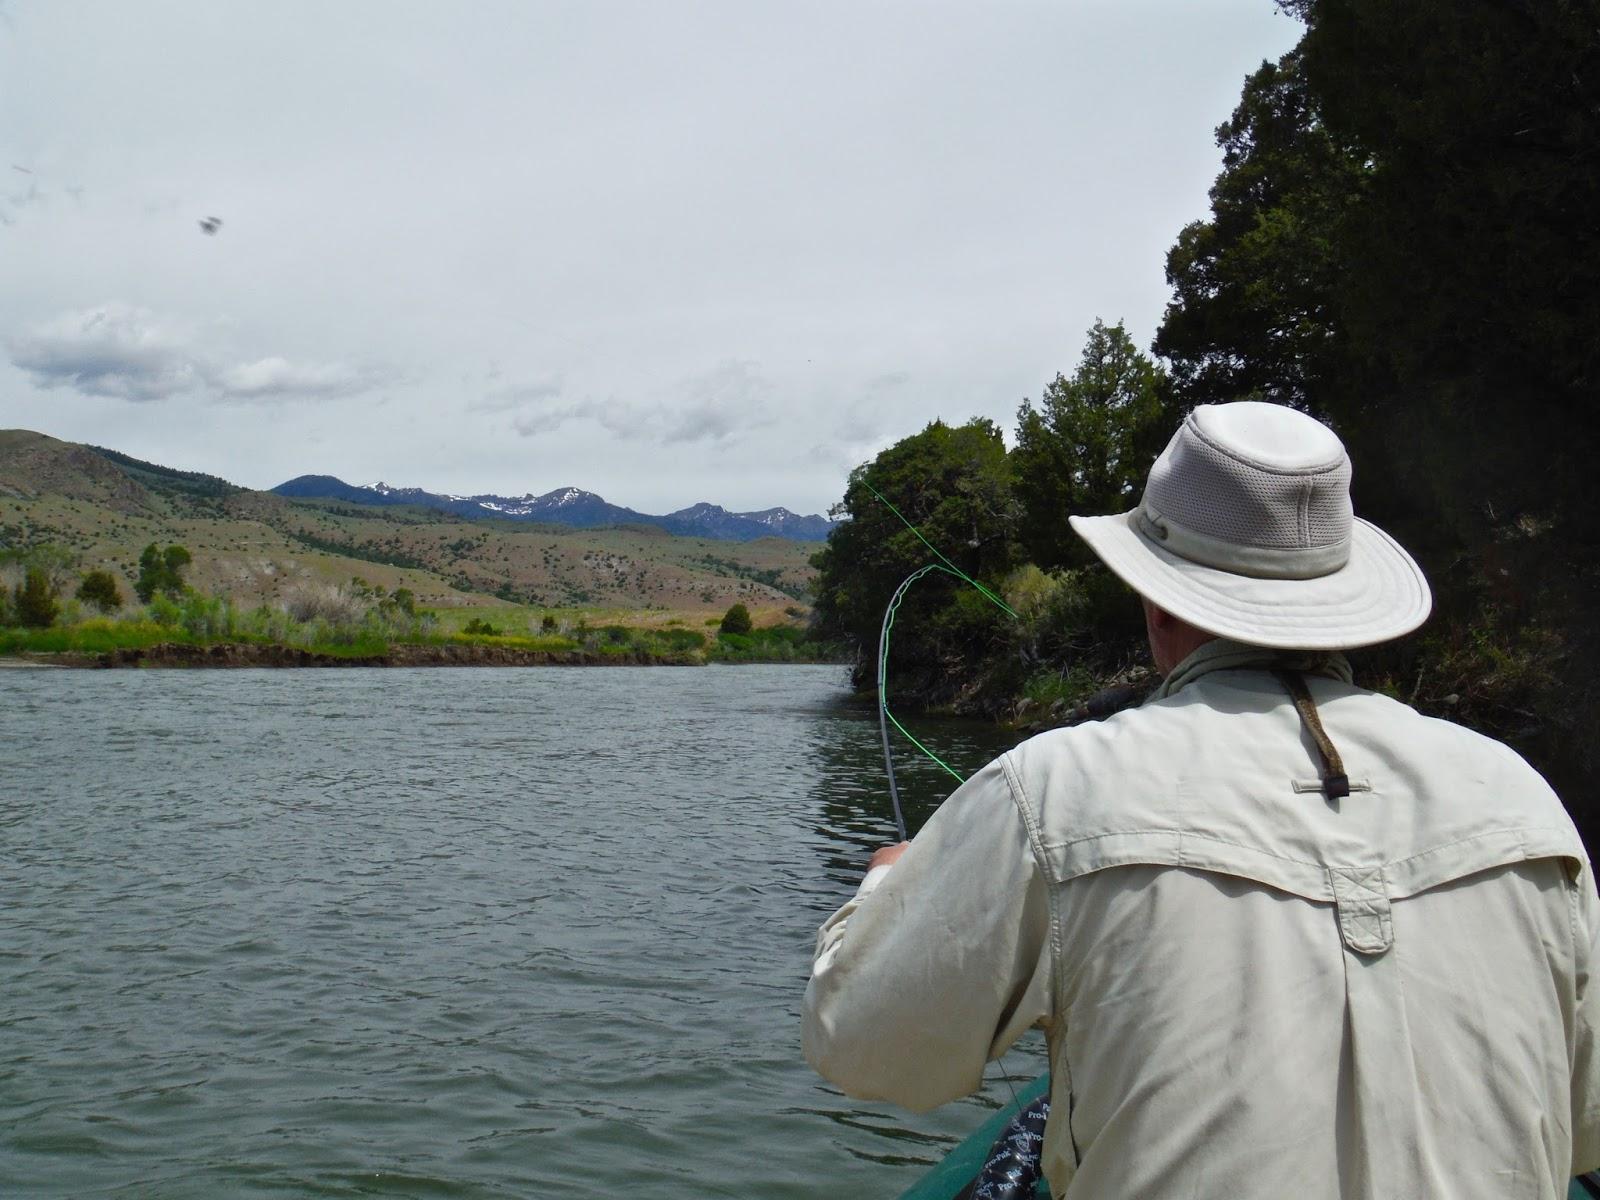 Erik s fly fishing blog yellowstone river salmon fly hatch for Fly fishing yellowstone